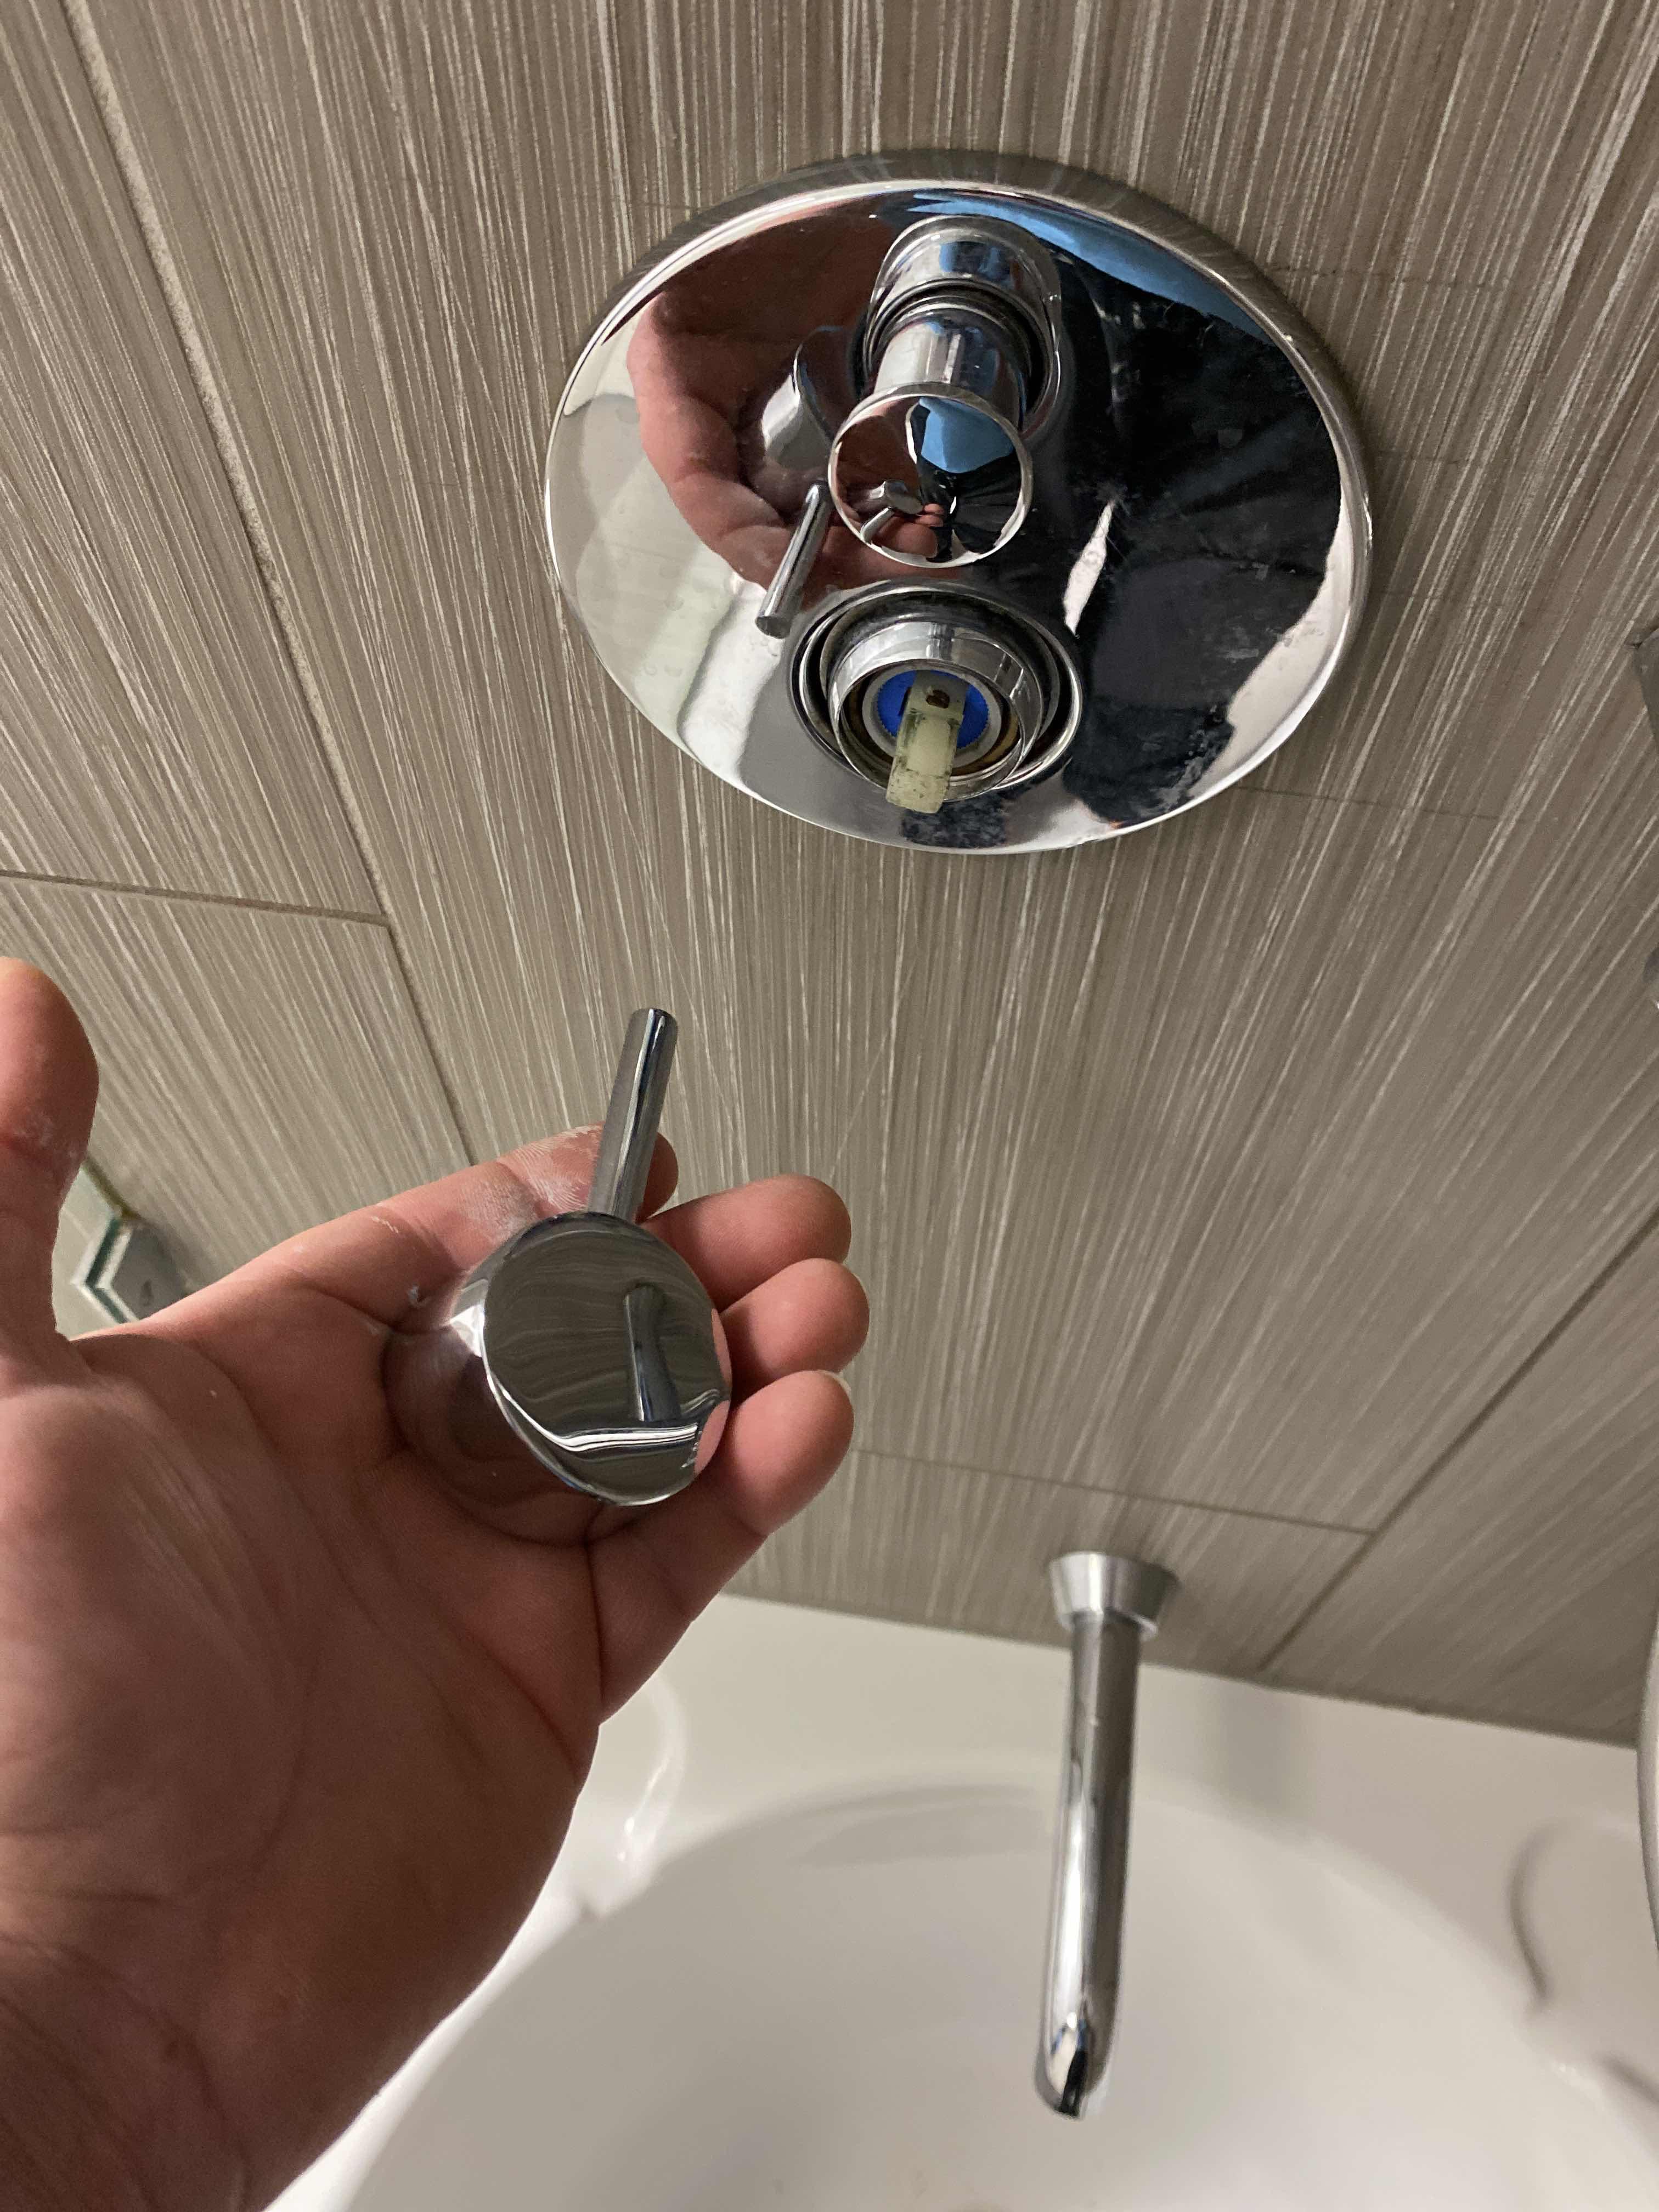 Shower tap Repair at Richmond VIC By Triple O Property Maintenance via i4Tradies